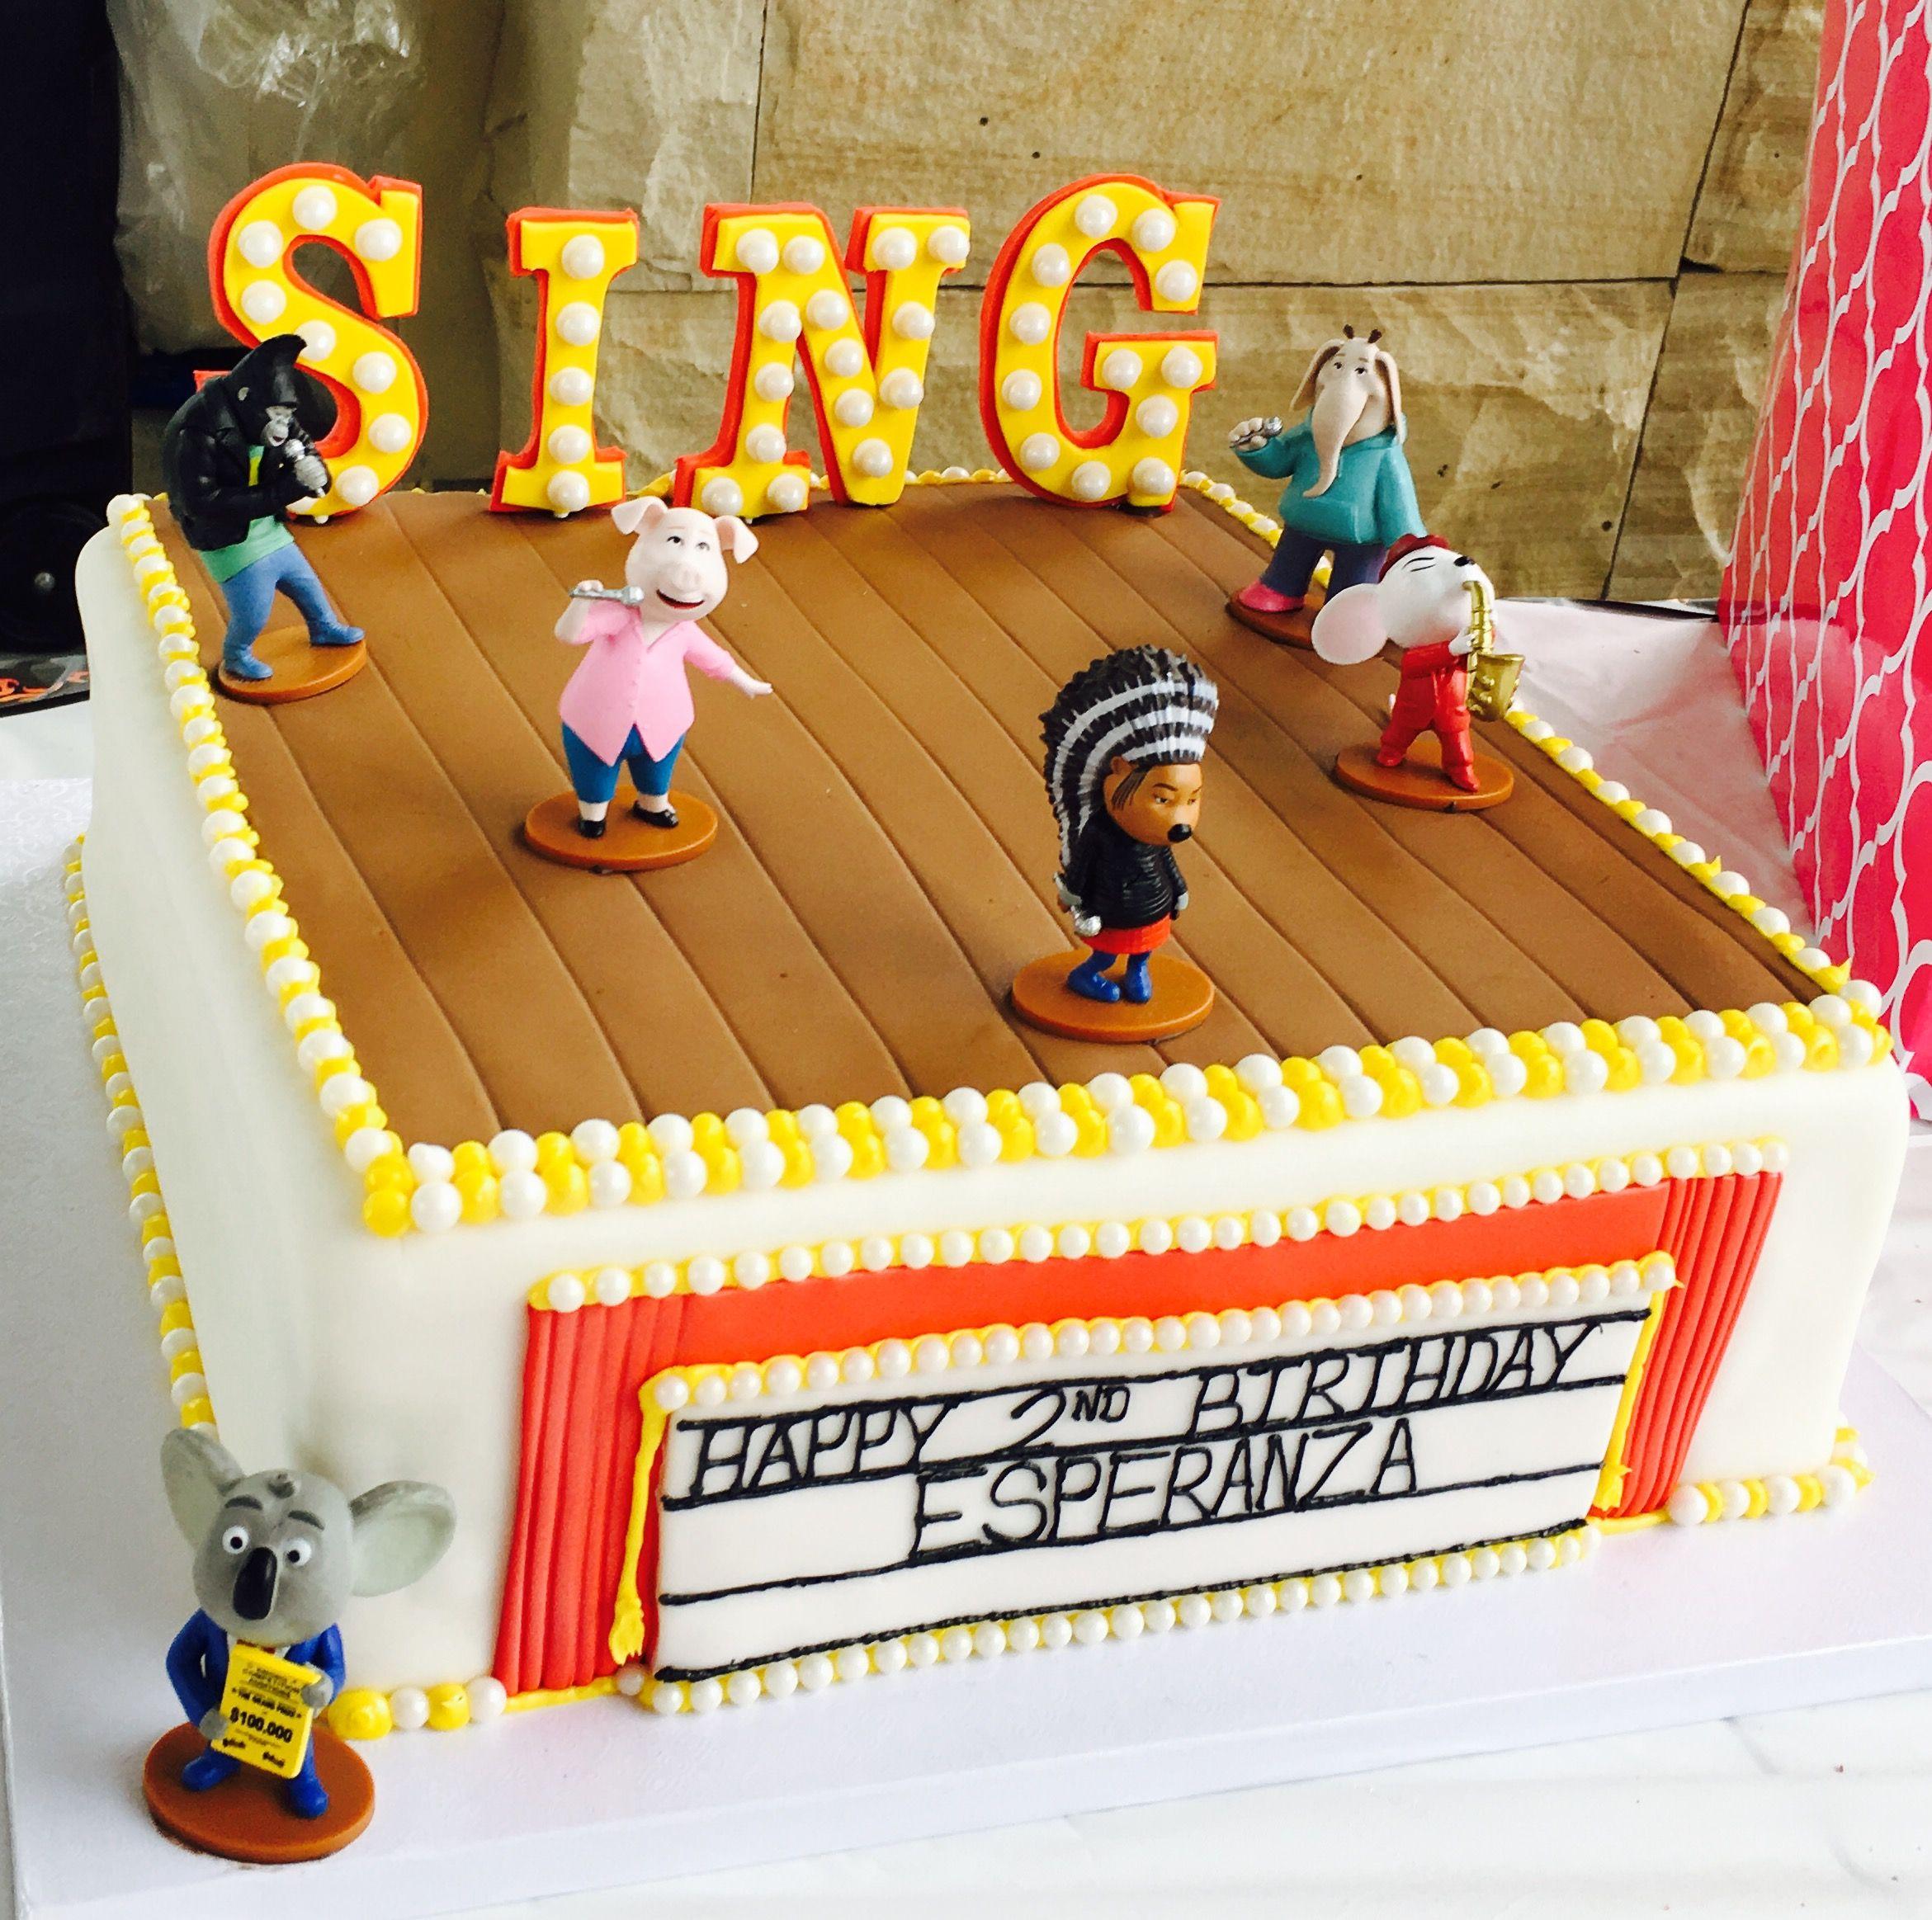 Sing Birthday Cake created by Azucar Bakery in Denver Colorado. For my Esperanza.